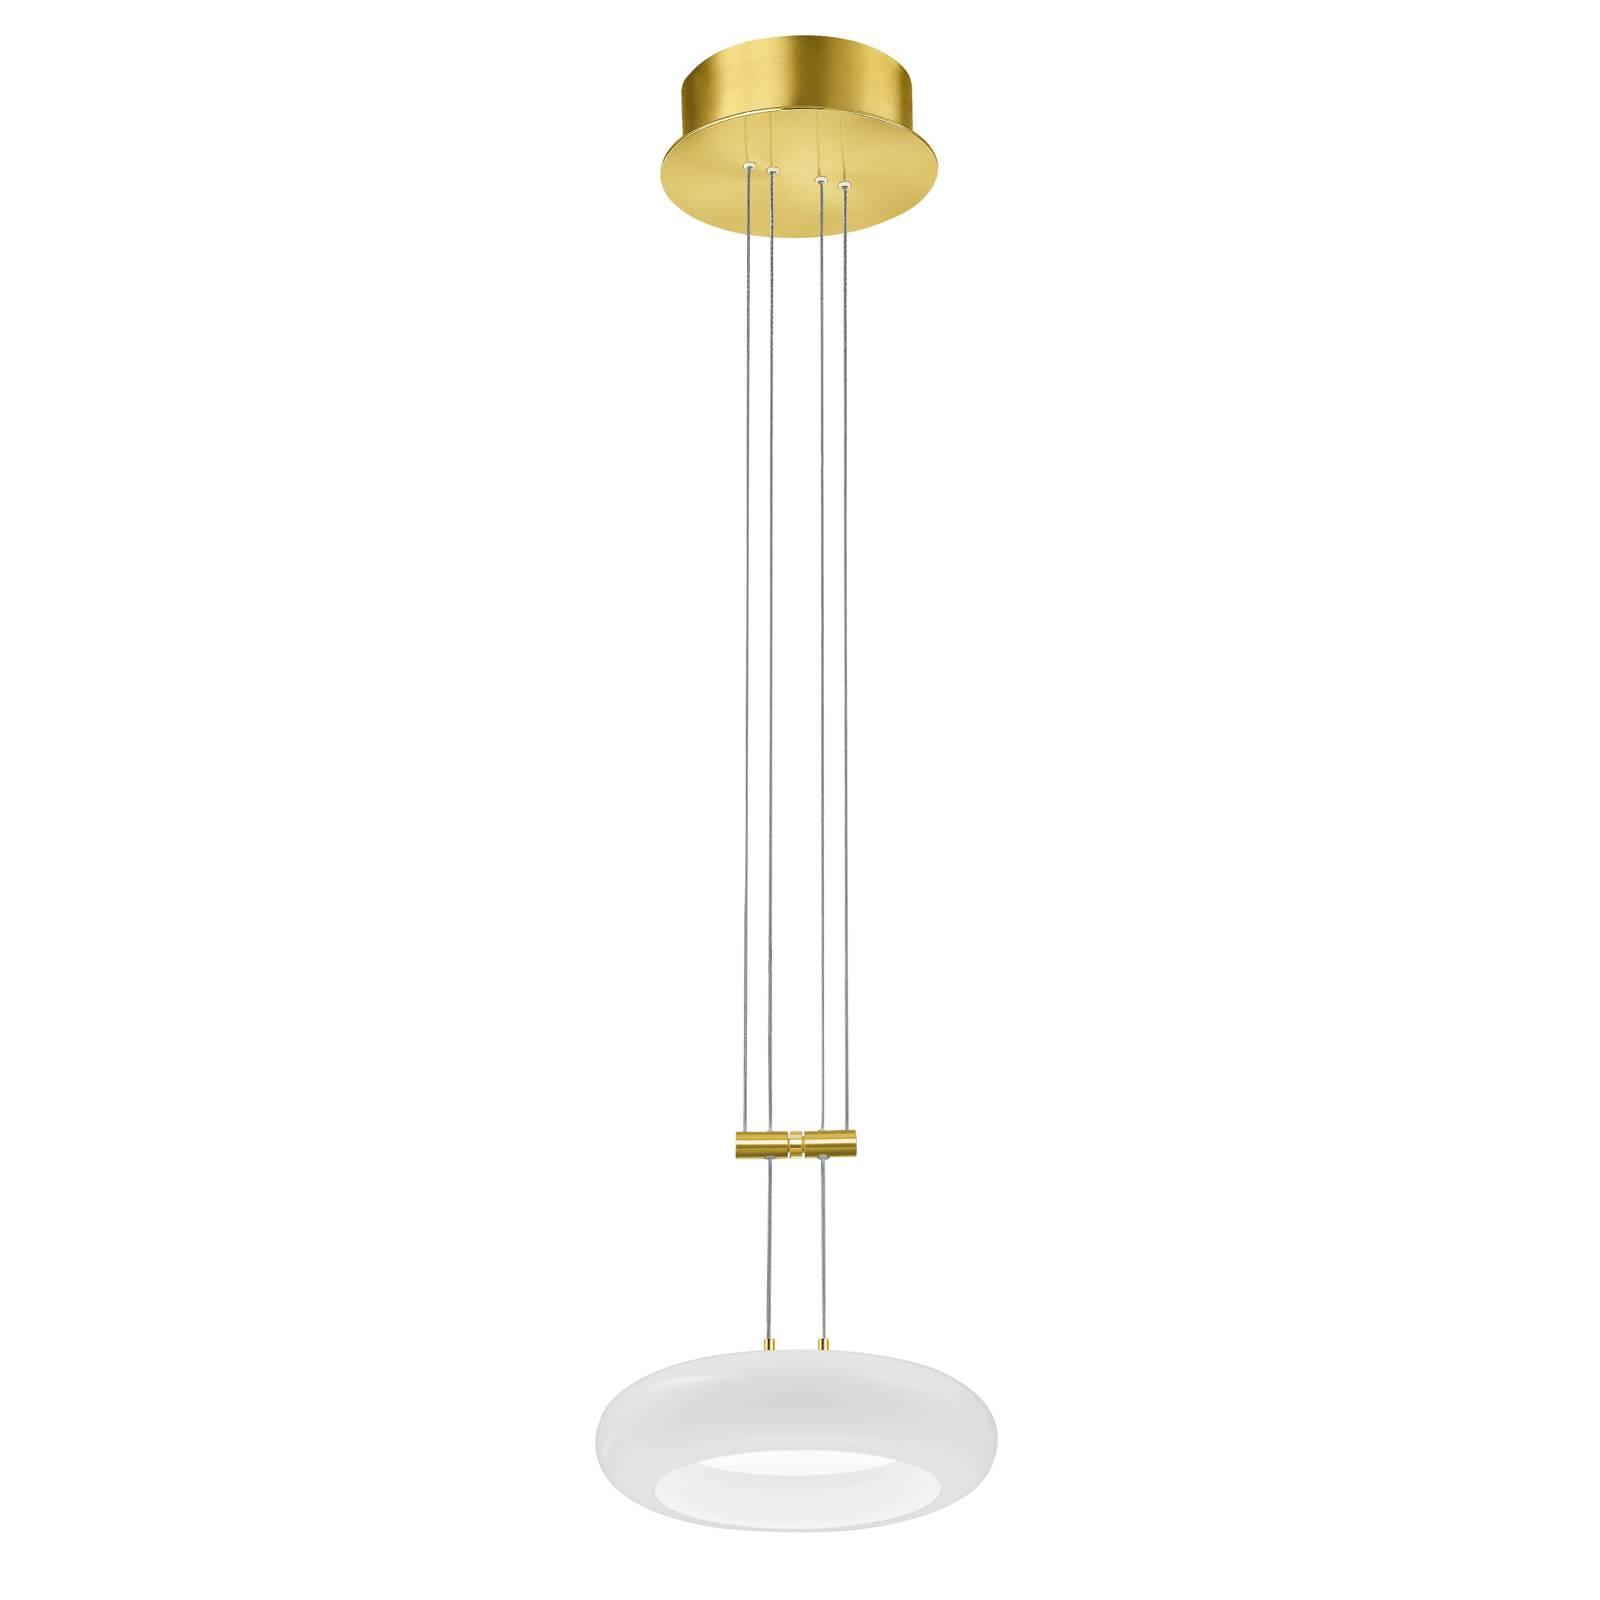 BANKAMP Centa riippuvalaisin 1-lamp 20 cm messinki